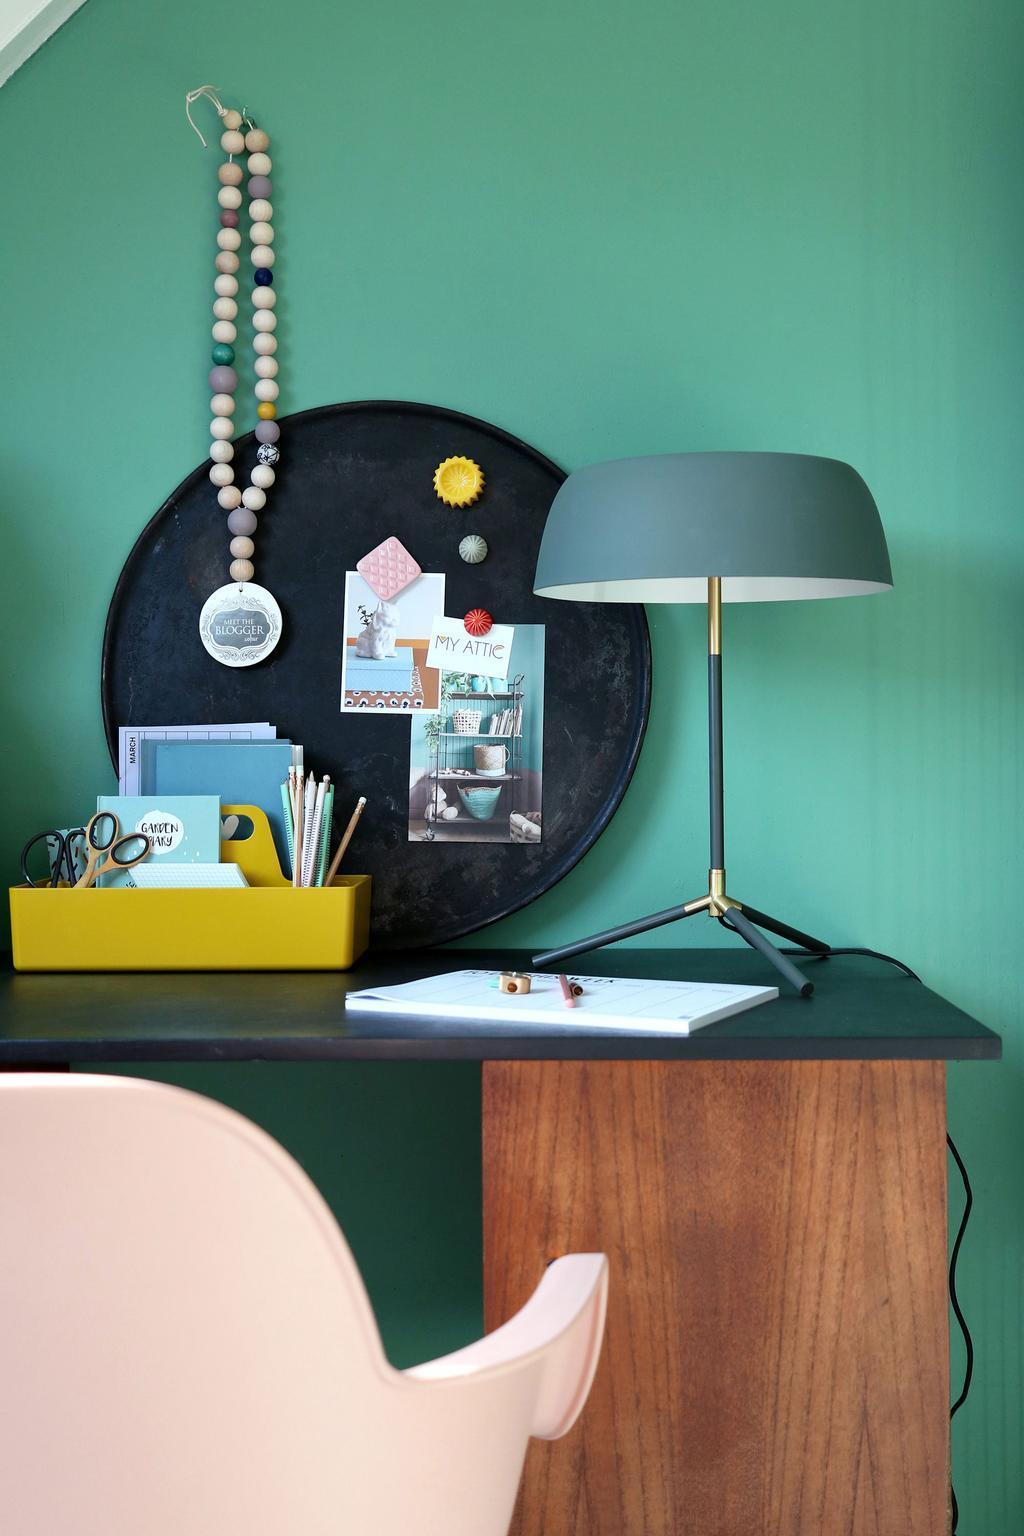 Taffellamp op de werkplek in het voorjaarshuis van blogger MY ATTIC